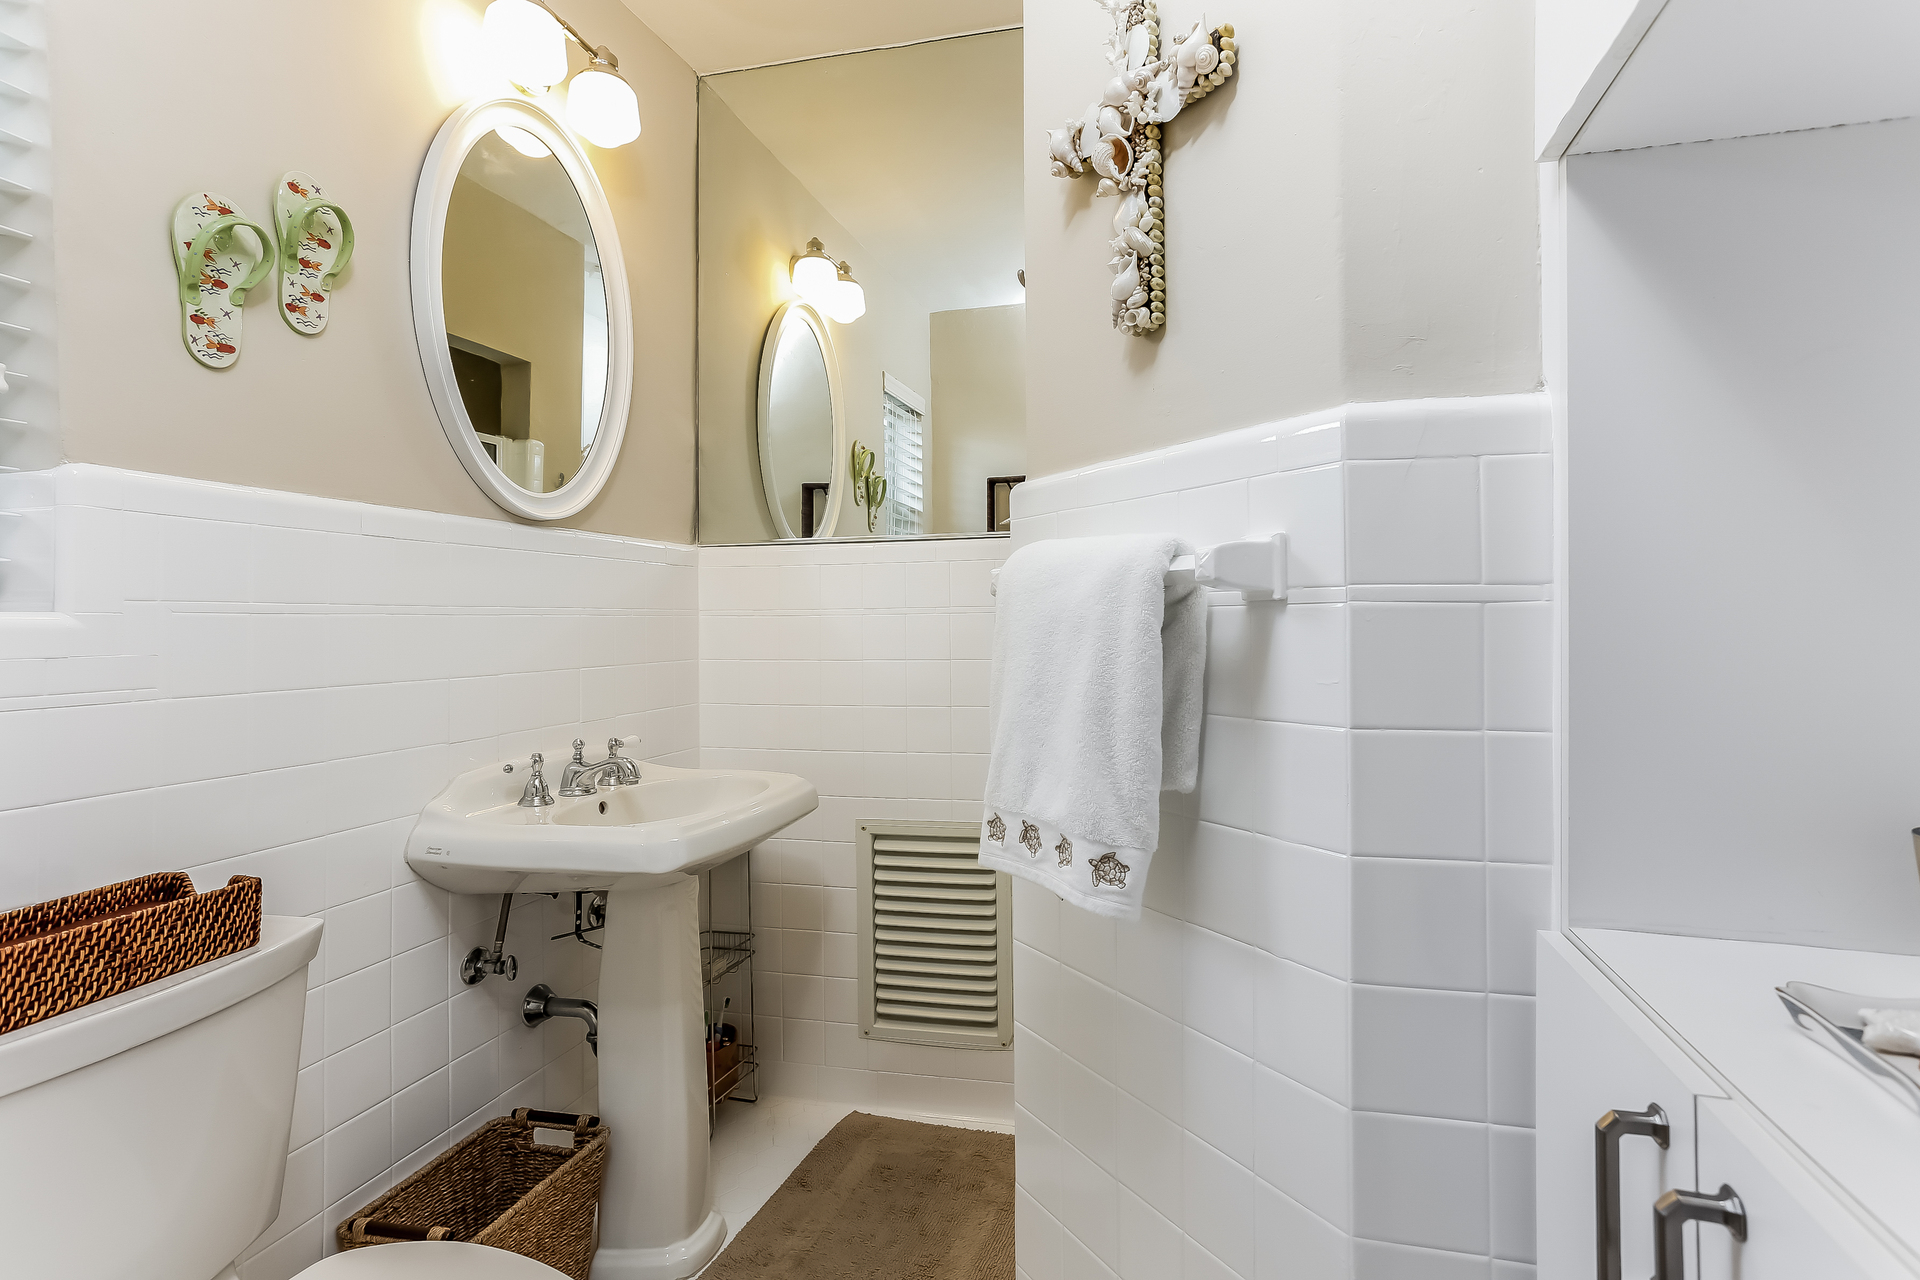 034-Bathroom-2647617-medium.jpg